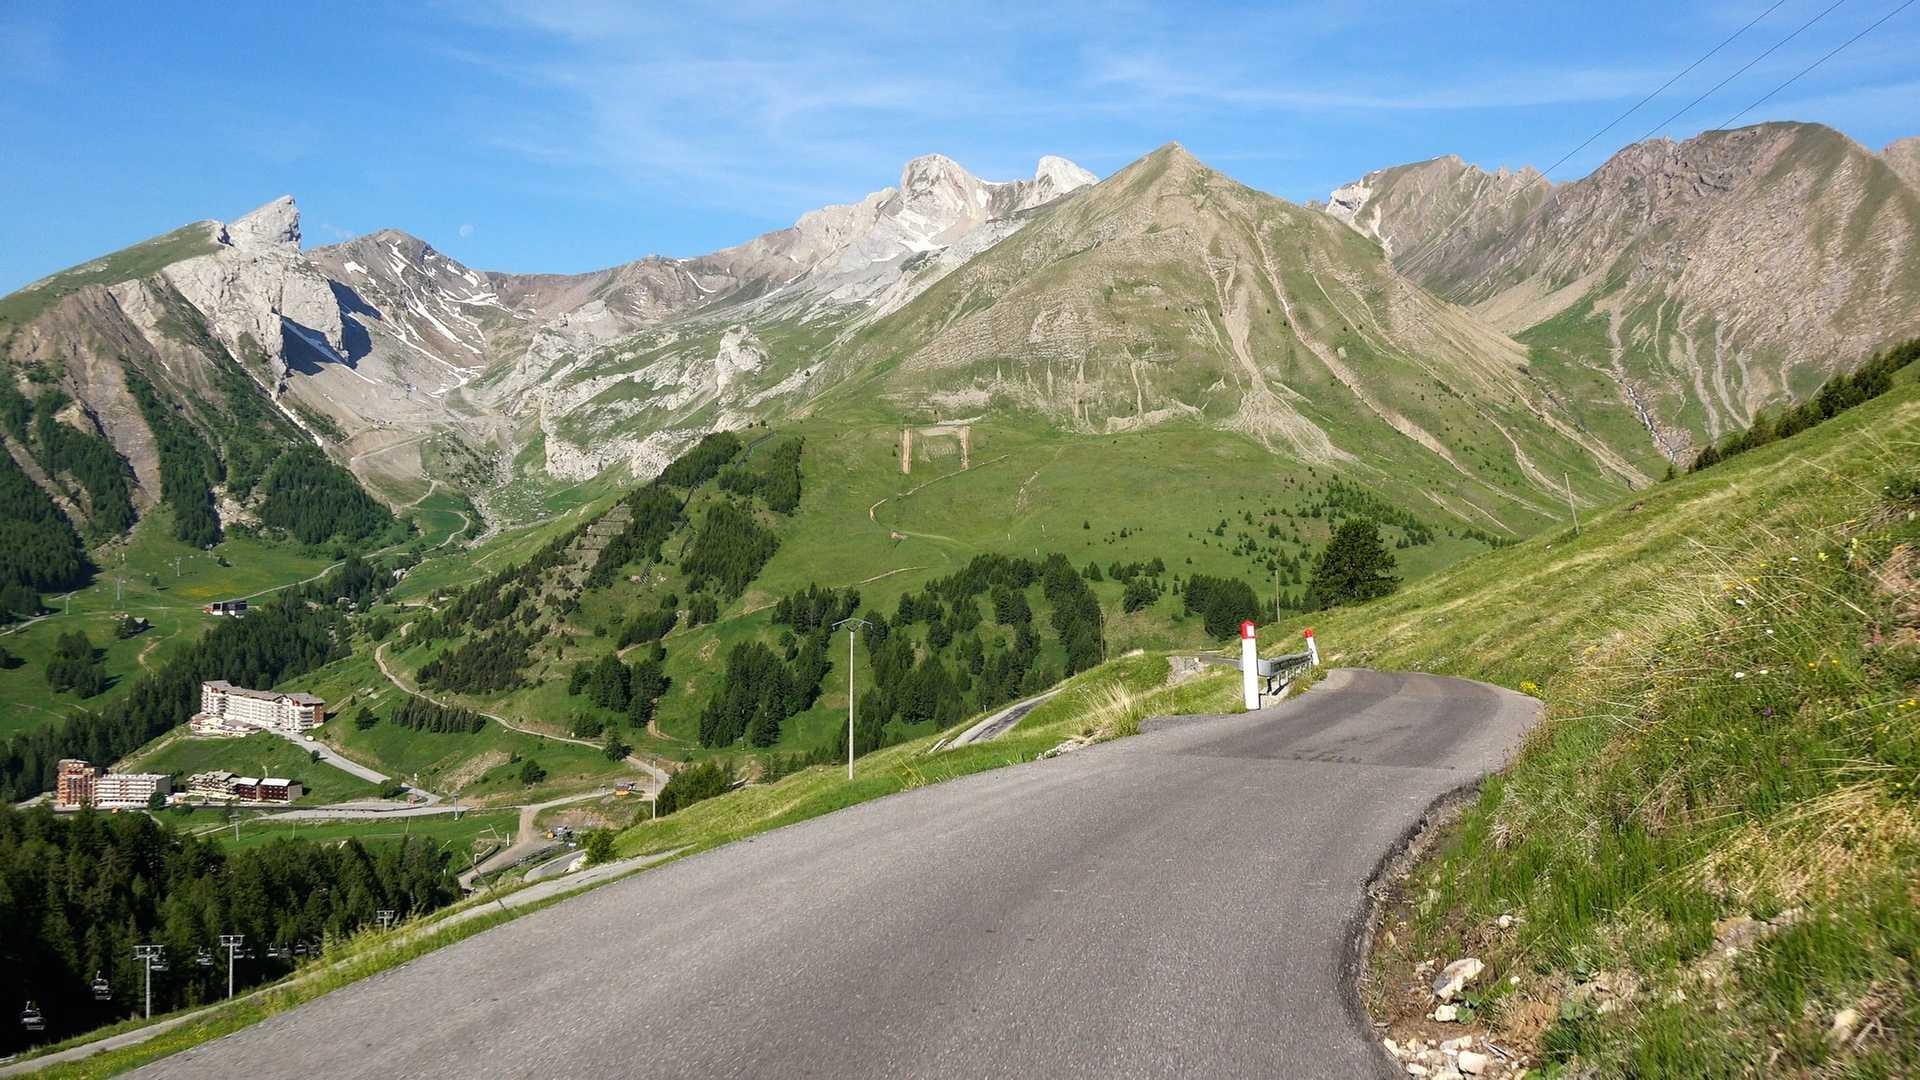 Part 1 of Mercantour Loop Grand Tour Thumbnail